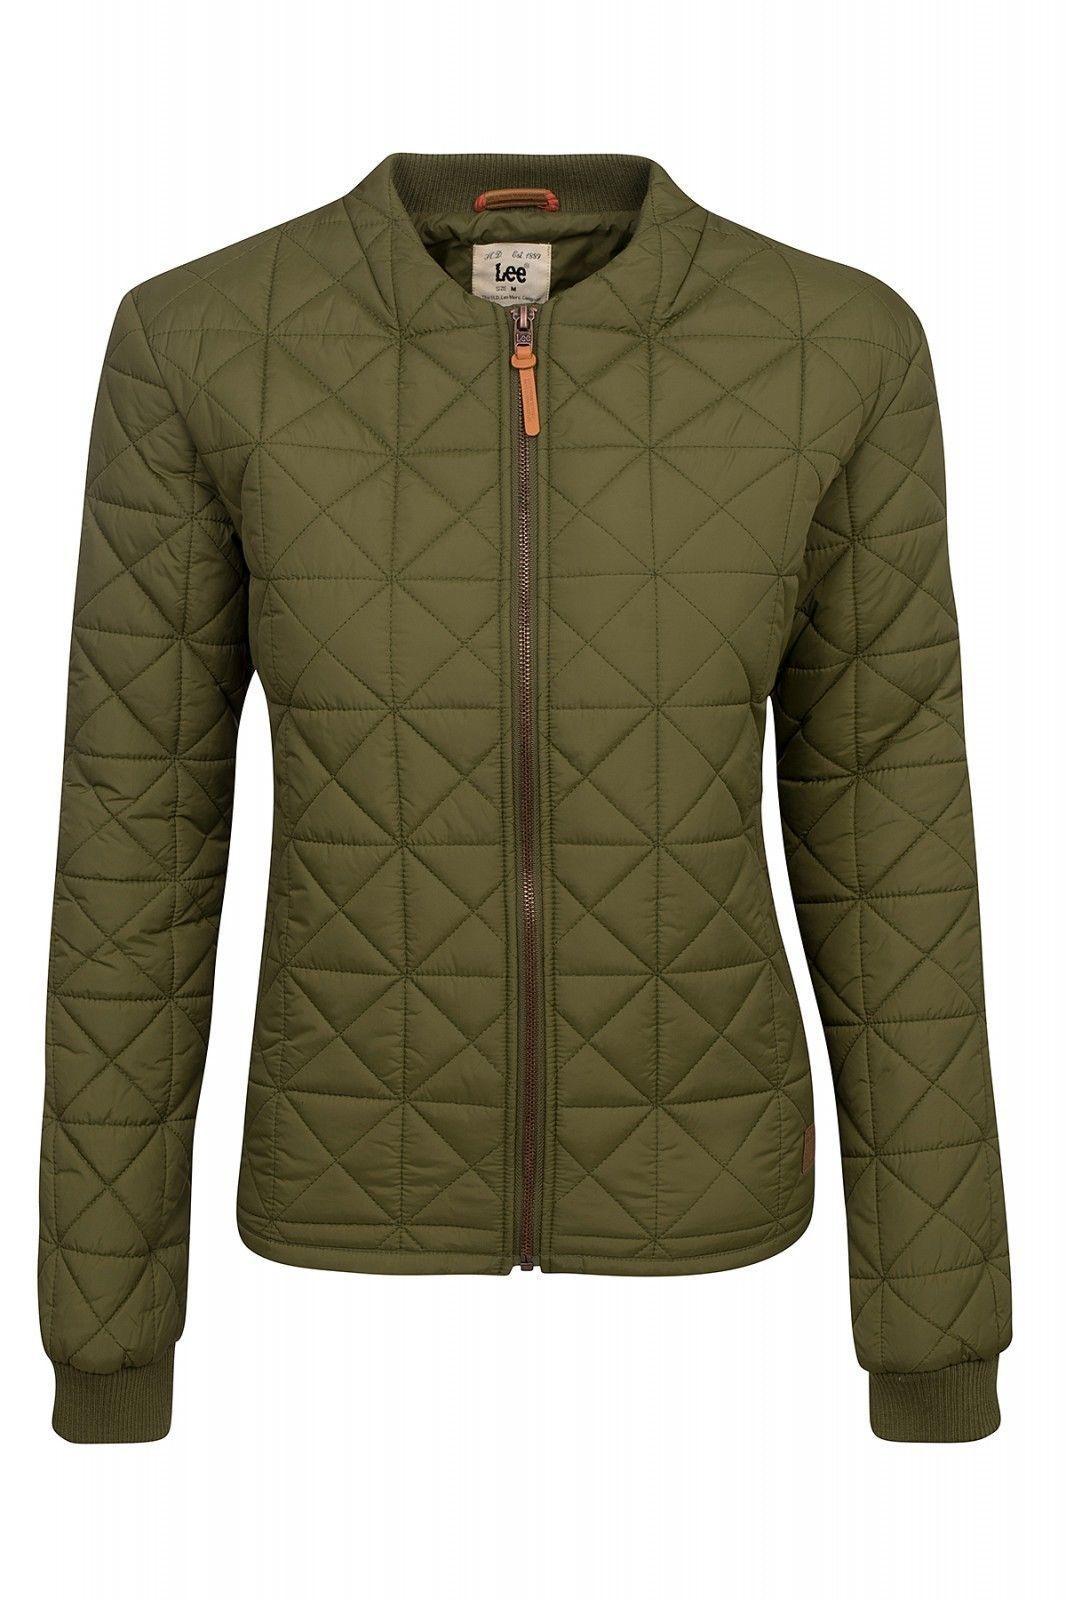 4c69cbf2c44 Lee Nylon Bomber Jacket Ladies Quilted Green Women S Sale Wow ...